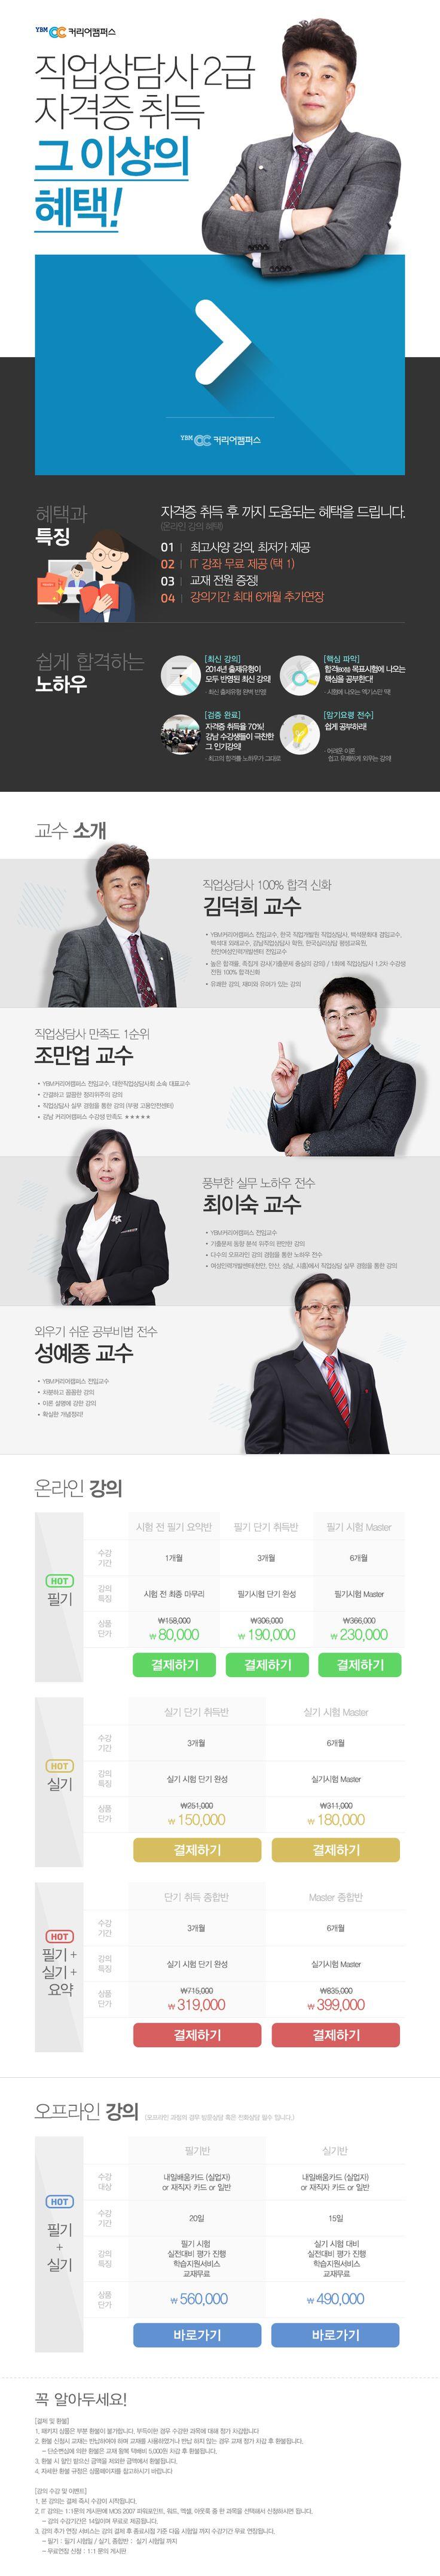 [YBMCC] 직업상담사 통합페이지 (노)